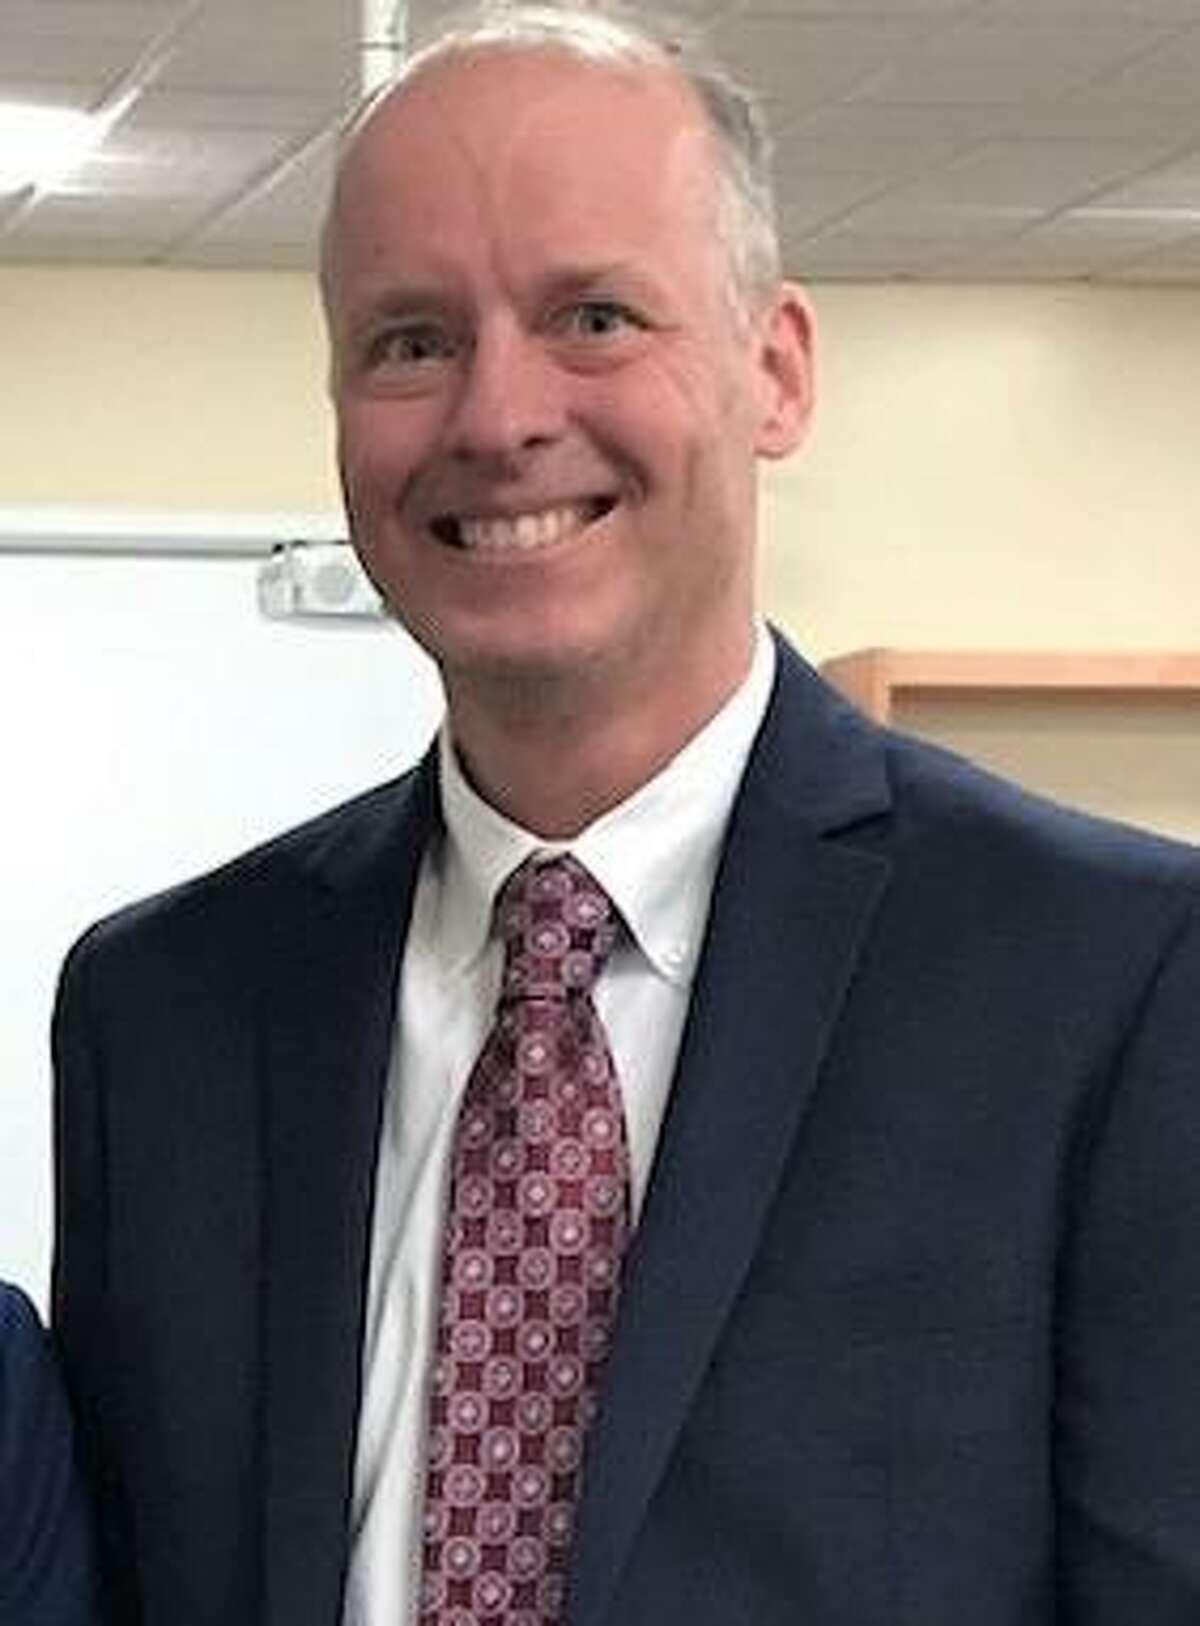 Portland Superintendent of Schools Charles Britton